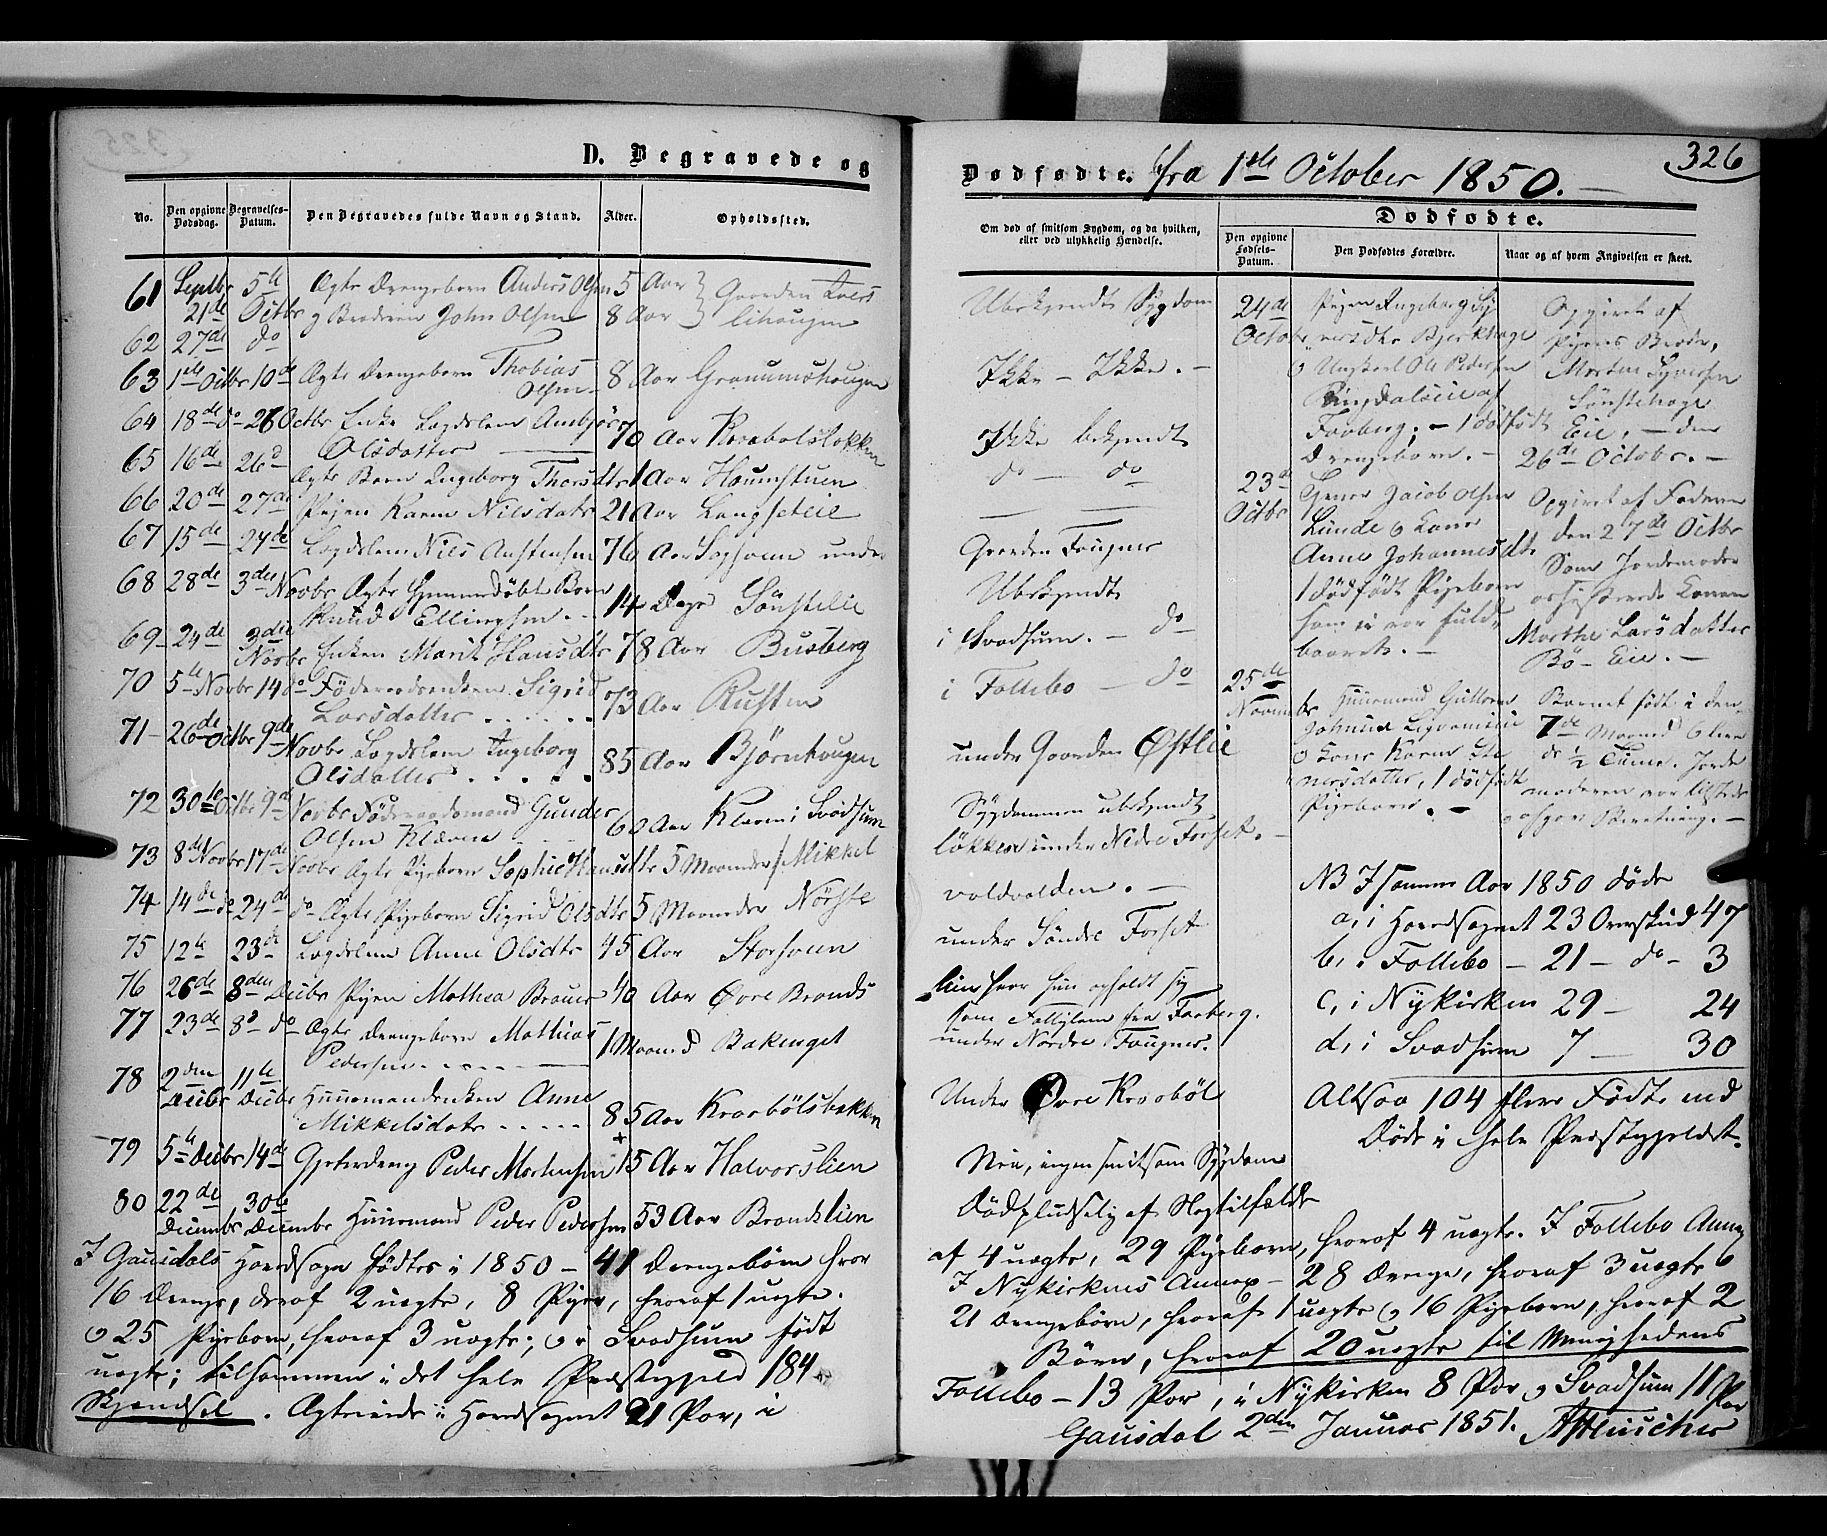 SAH, Gausdal prestekontor, Ministerialbok nr. 8, 1850-1861, s. 326